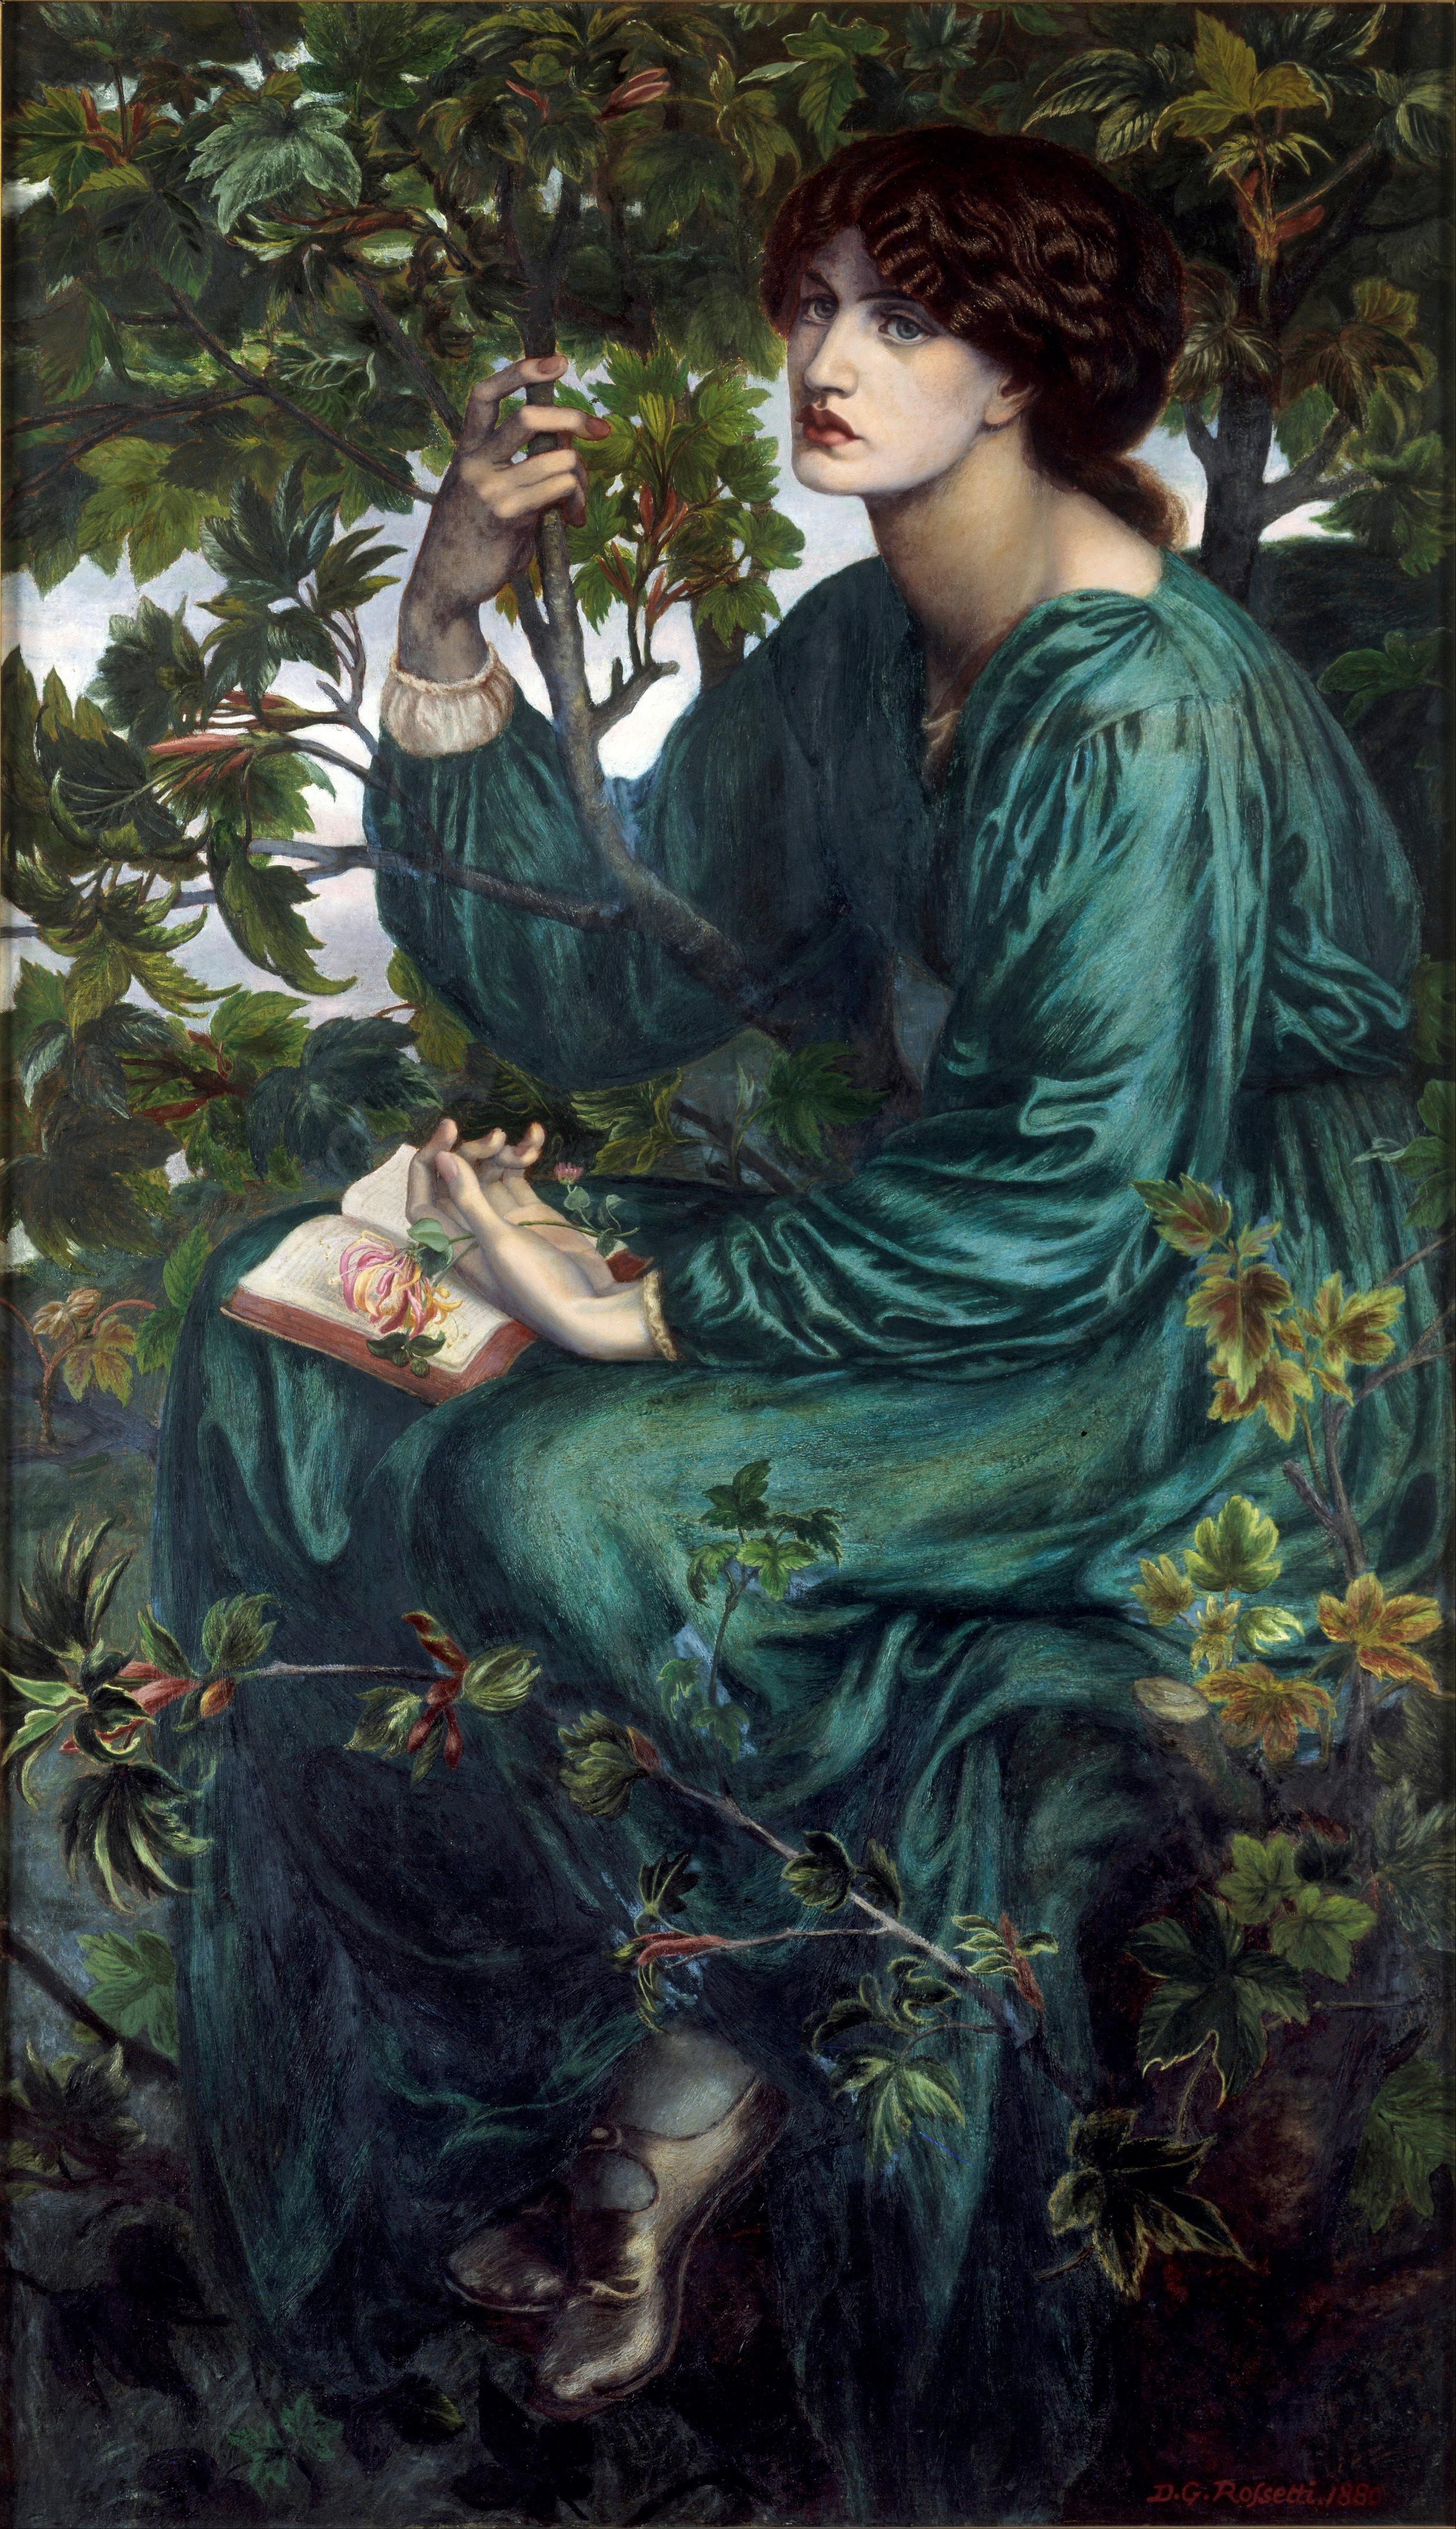 """The Daydreamer"" - 1880"